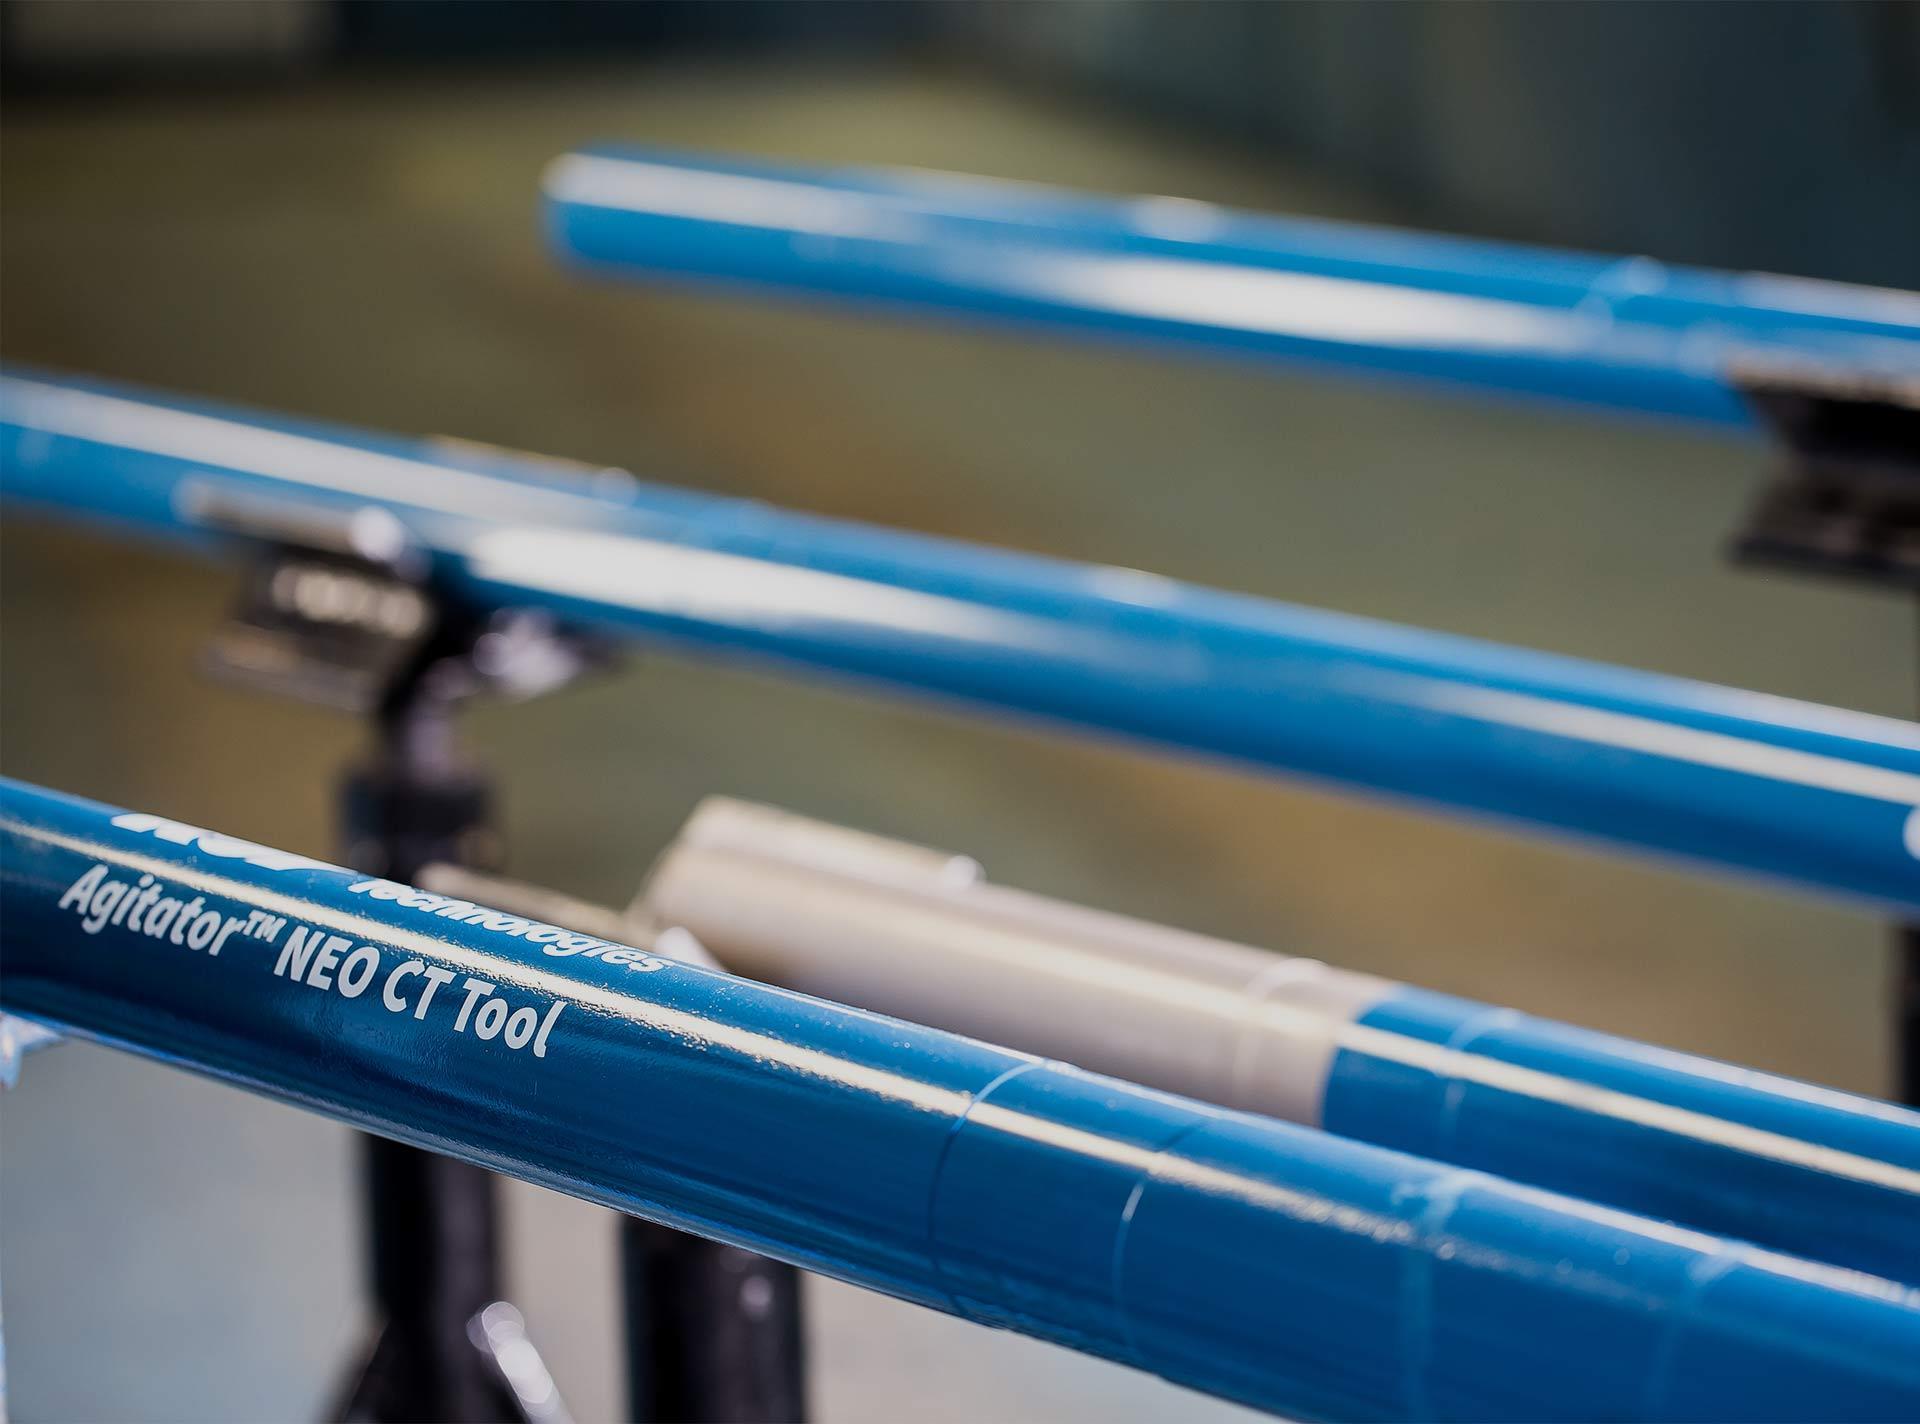 Close up of Agitator NEO Coiled Tubing Tool